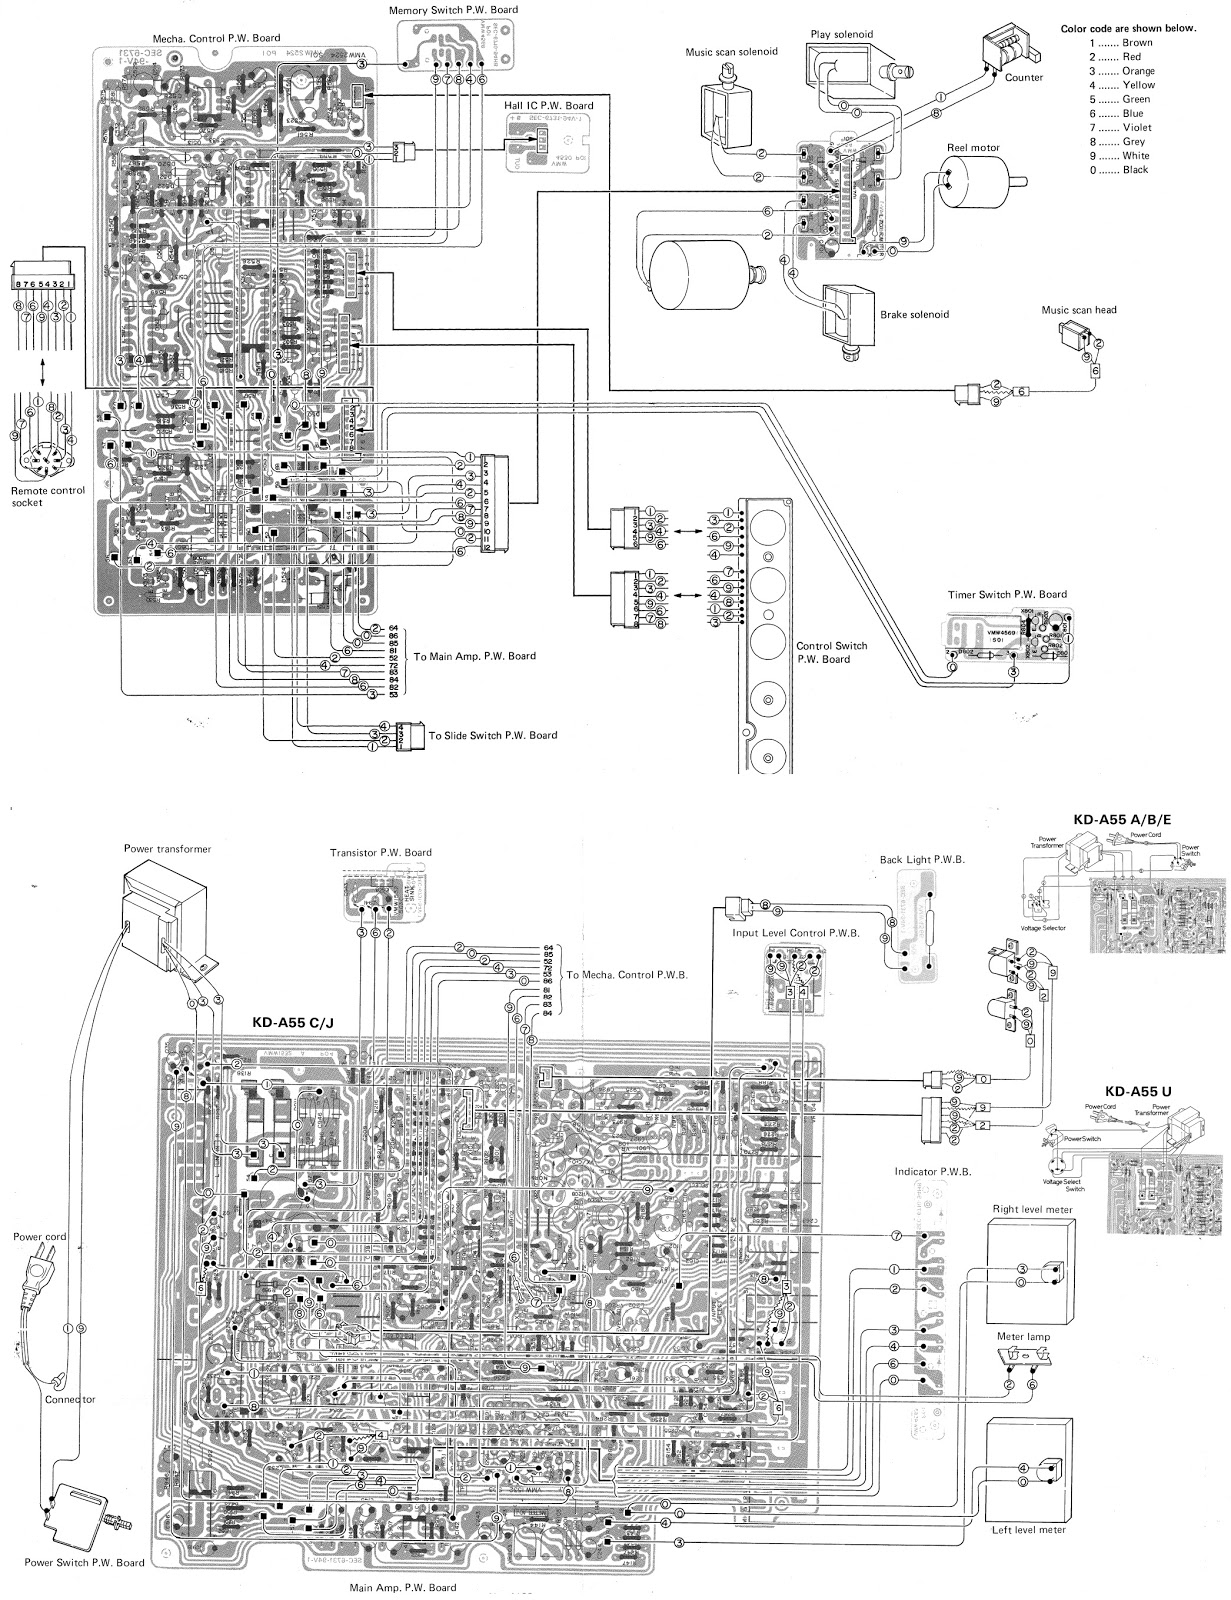 Tape Deck Wiring Diagram